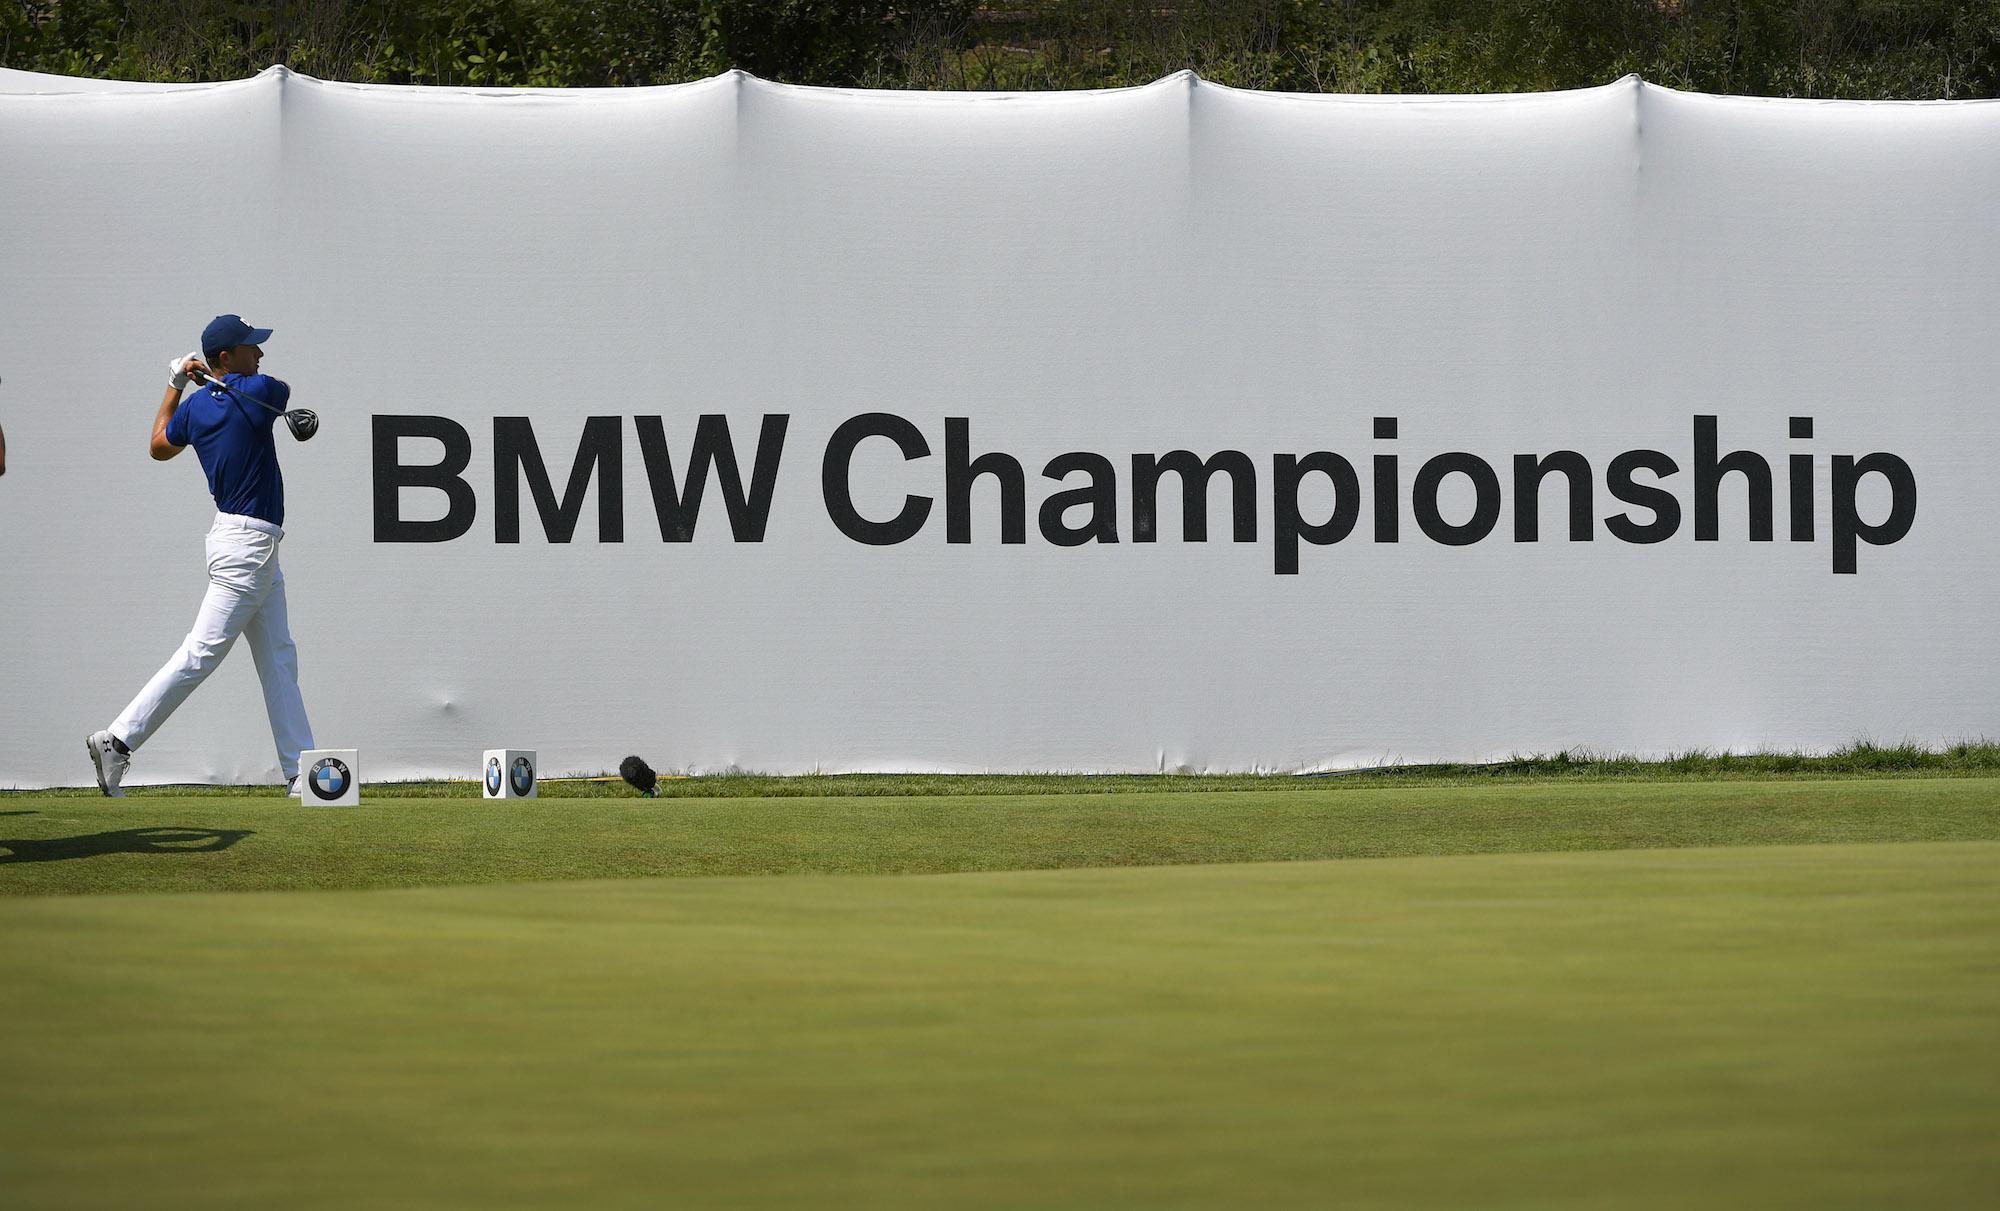 2018 BMW Championship: Round 1 - Teeing Off on No. 18